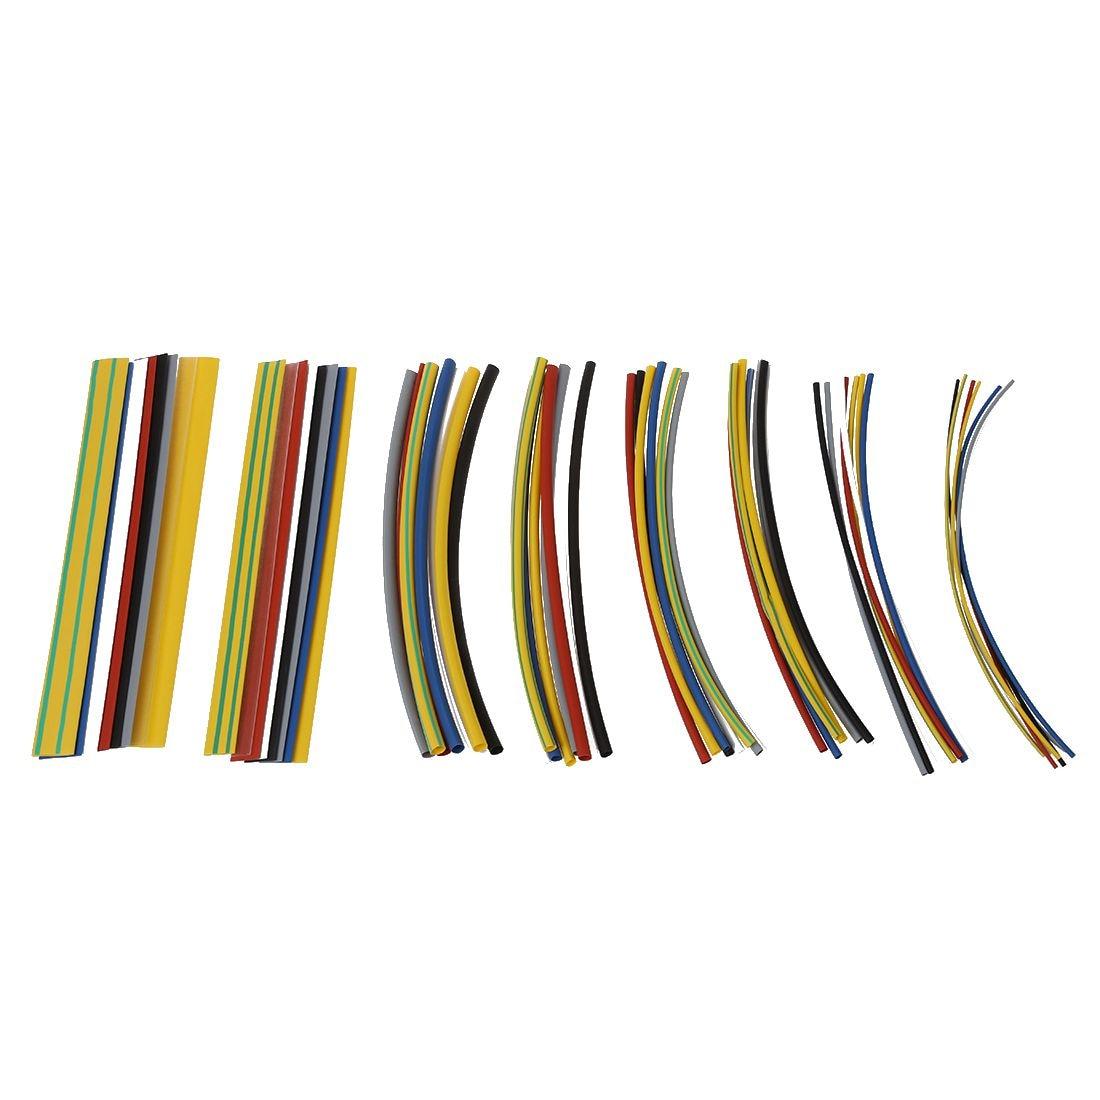 64 pcs Heat shrink tubing Set Assortment Shrink Hoses